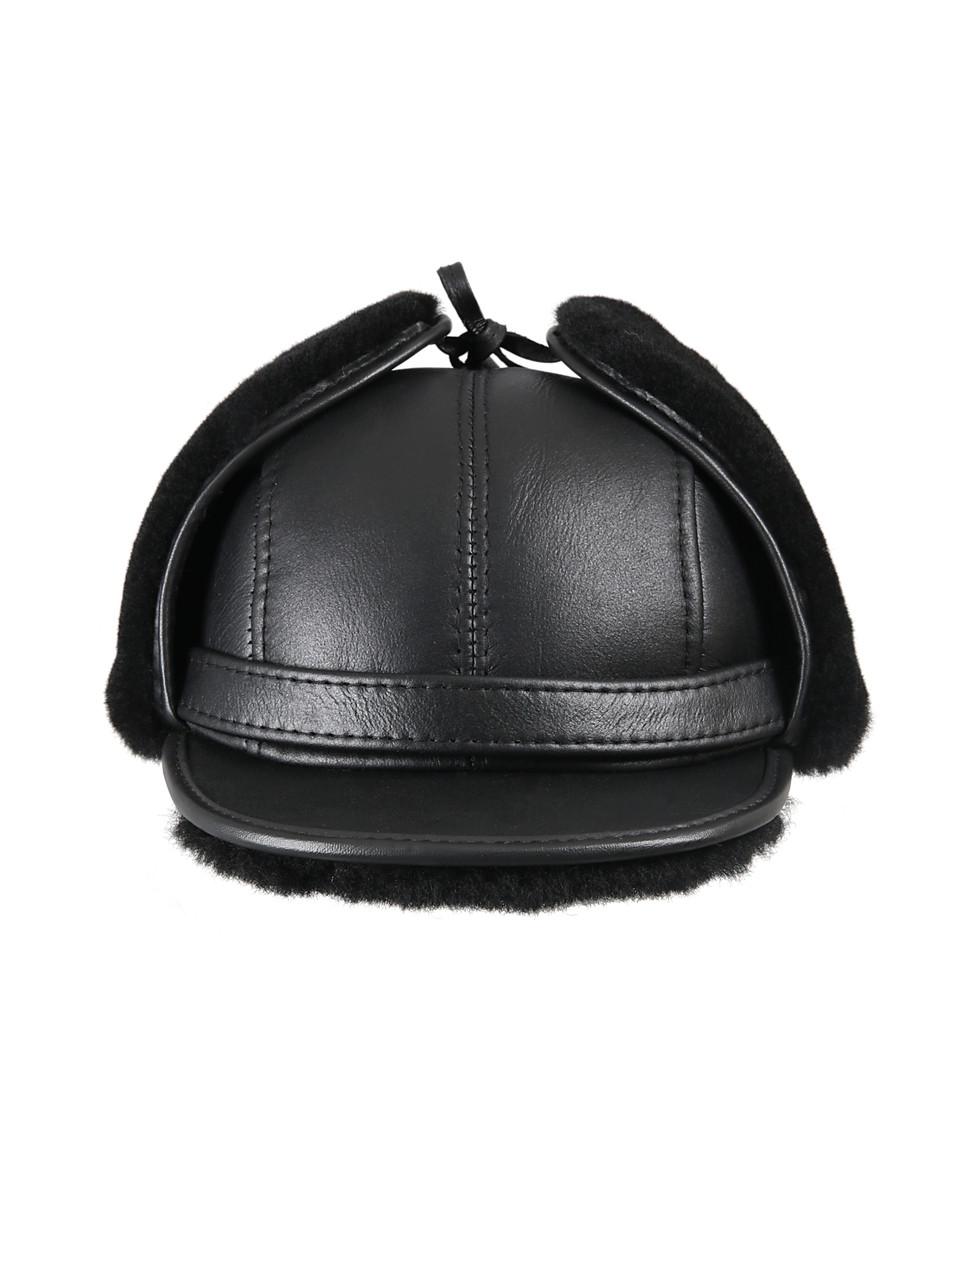 3e5b7ea2 ... Shearling Sheepskin Visor Winter Fur Hat - Solid Black. Image 1.  Loading zoom